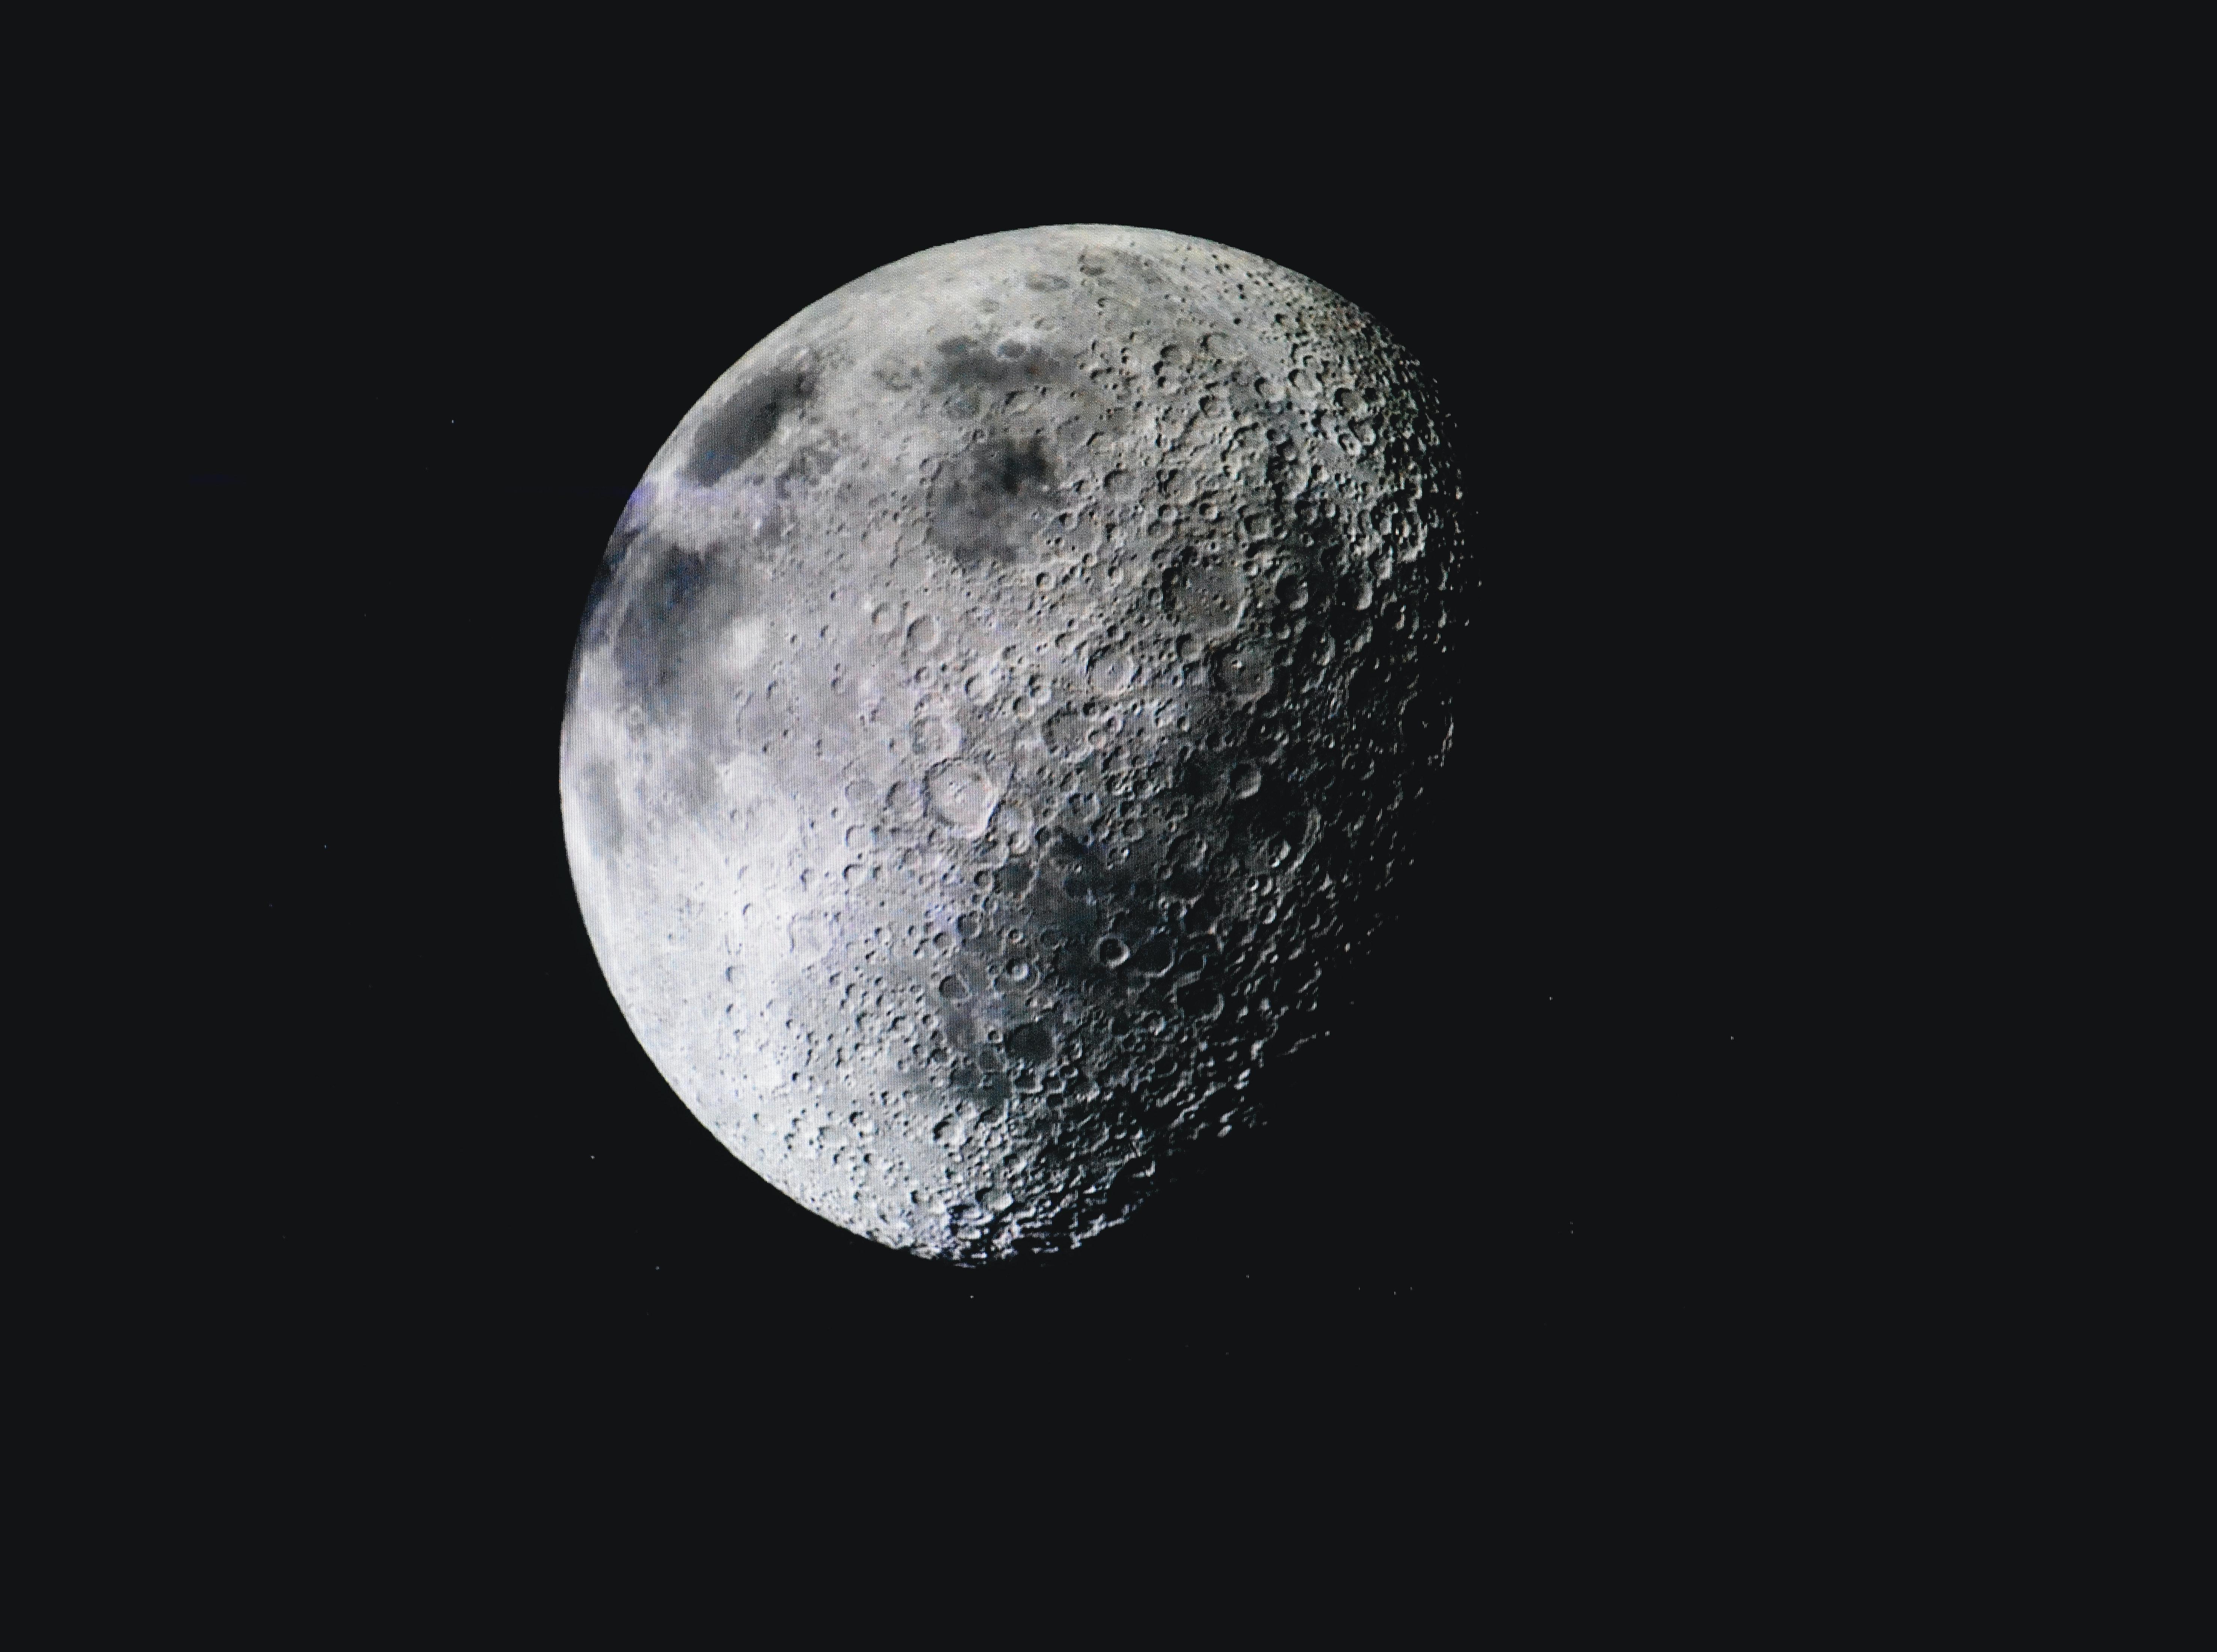 Moon on Focus Photo · Free Stock Photo